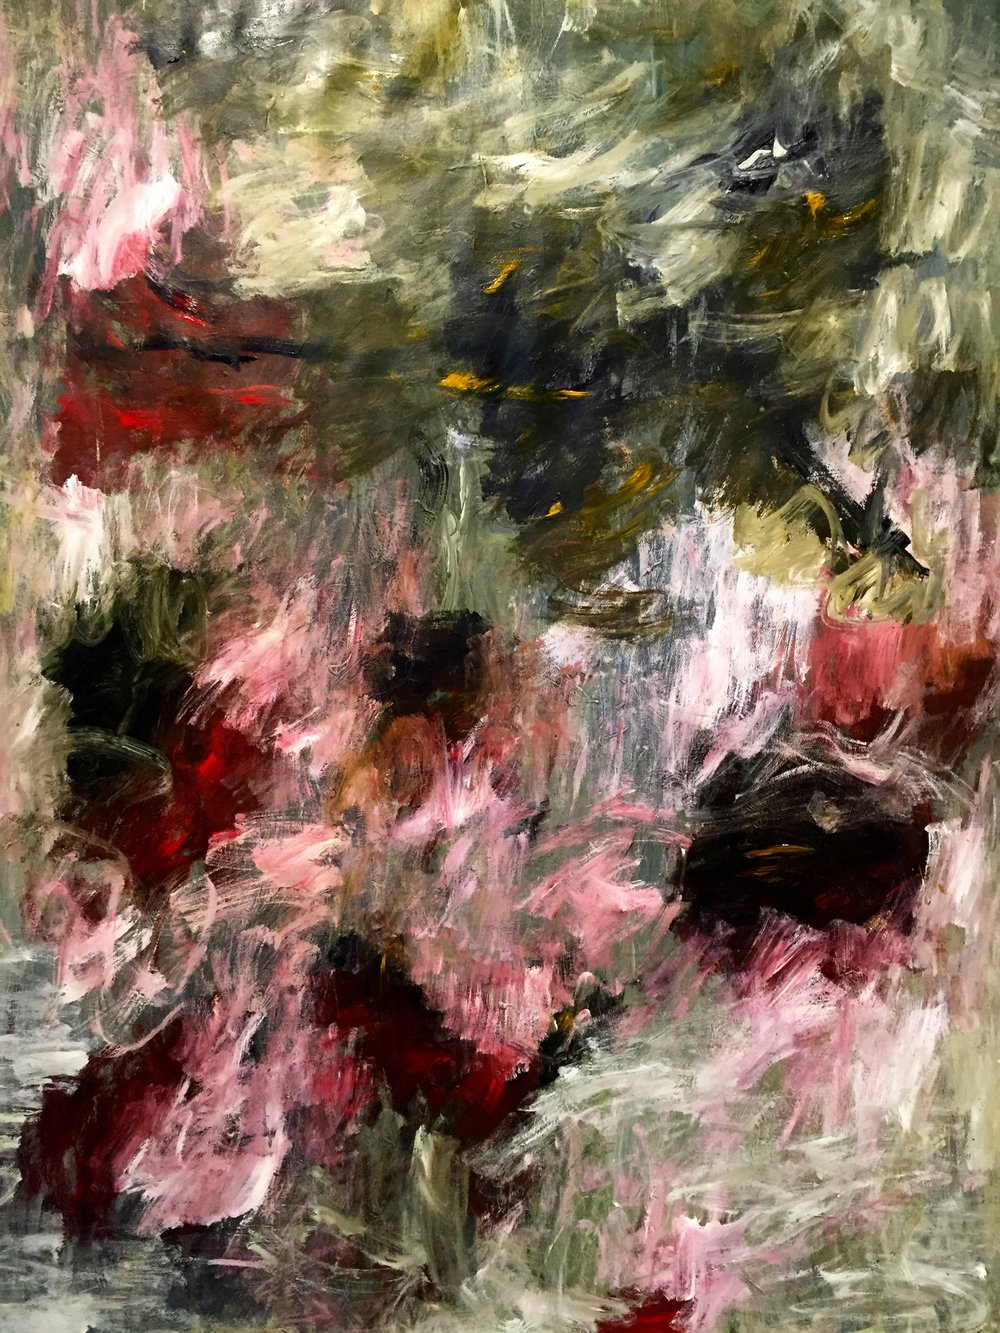 'Untitled' 2016